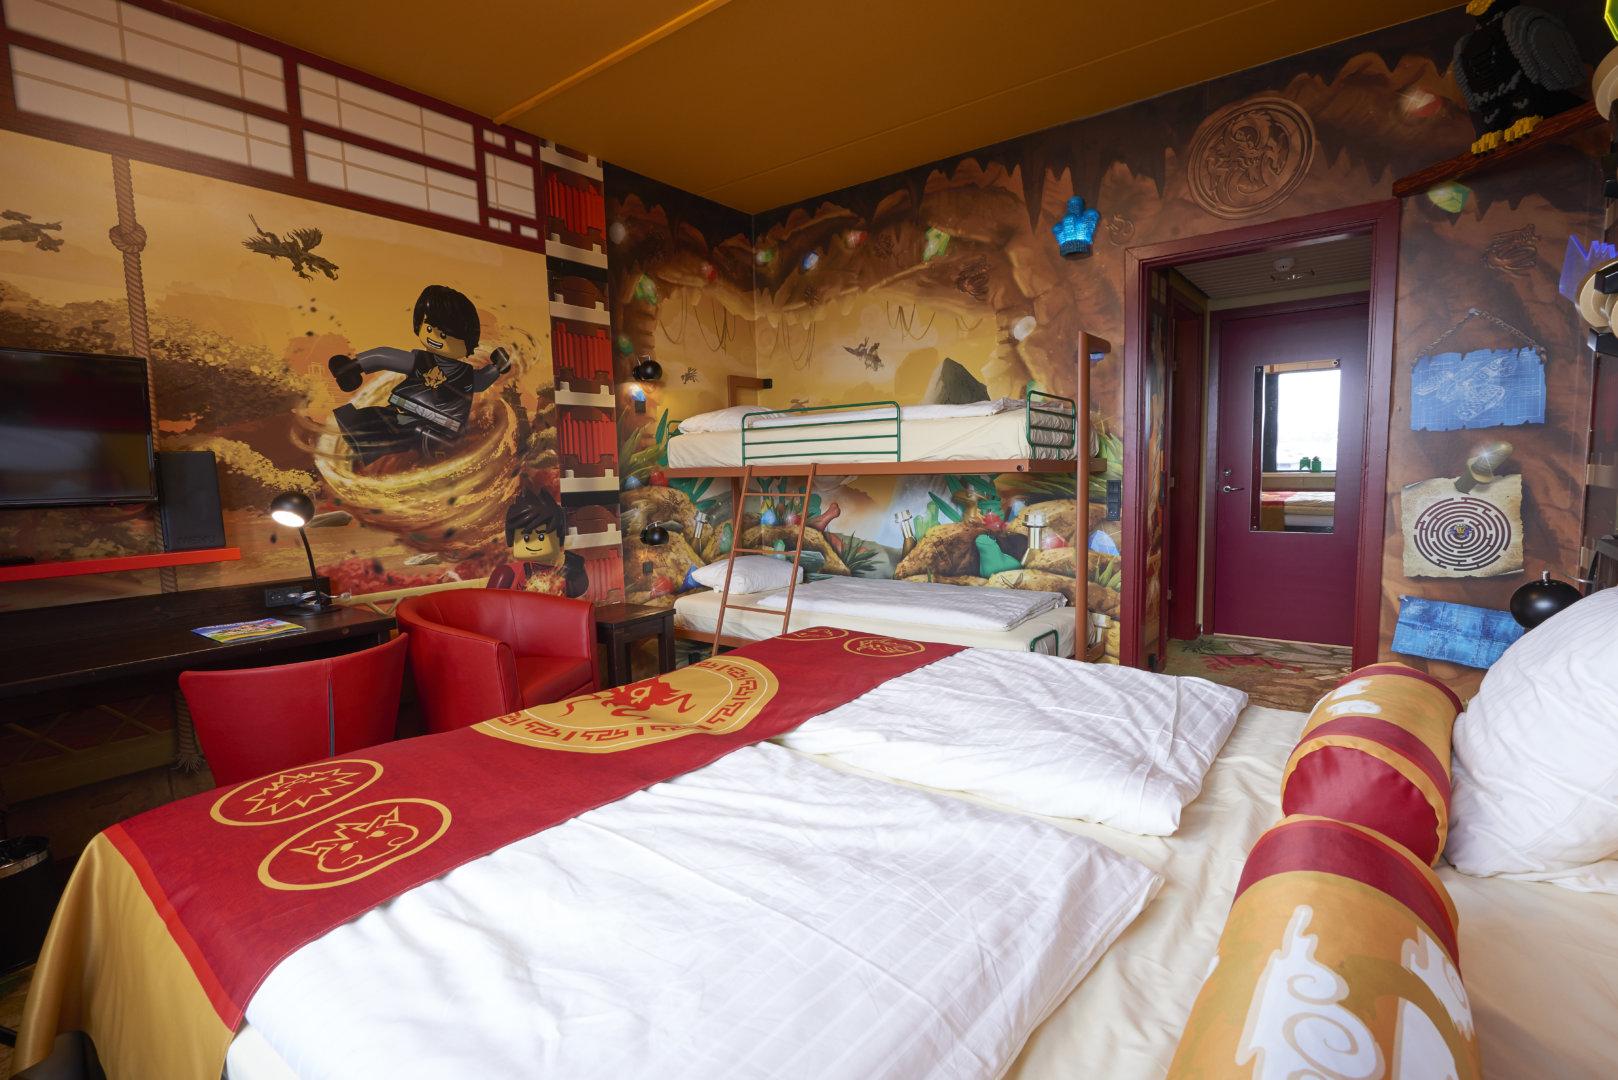 Hotel LEGOLAND Billund pokoje noclegi w parku LEGOLAND (2)